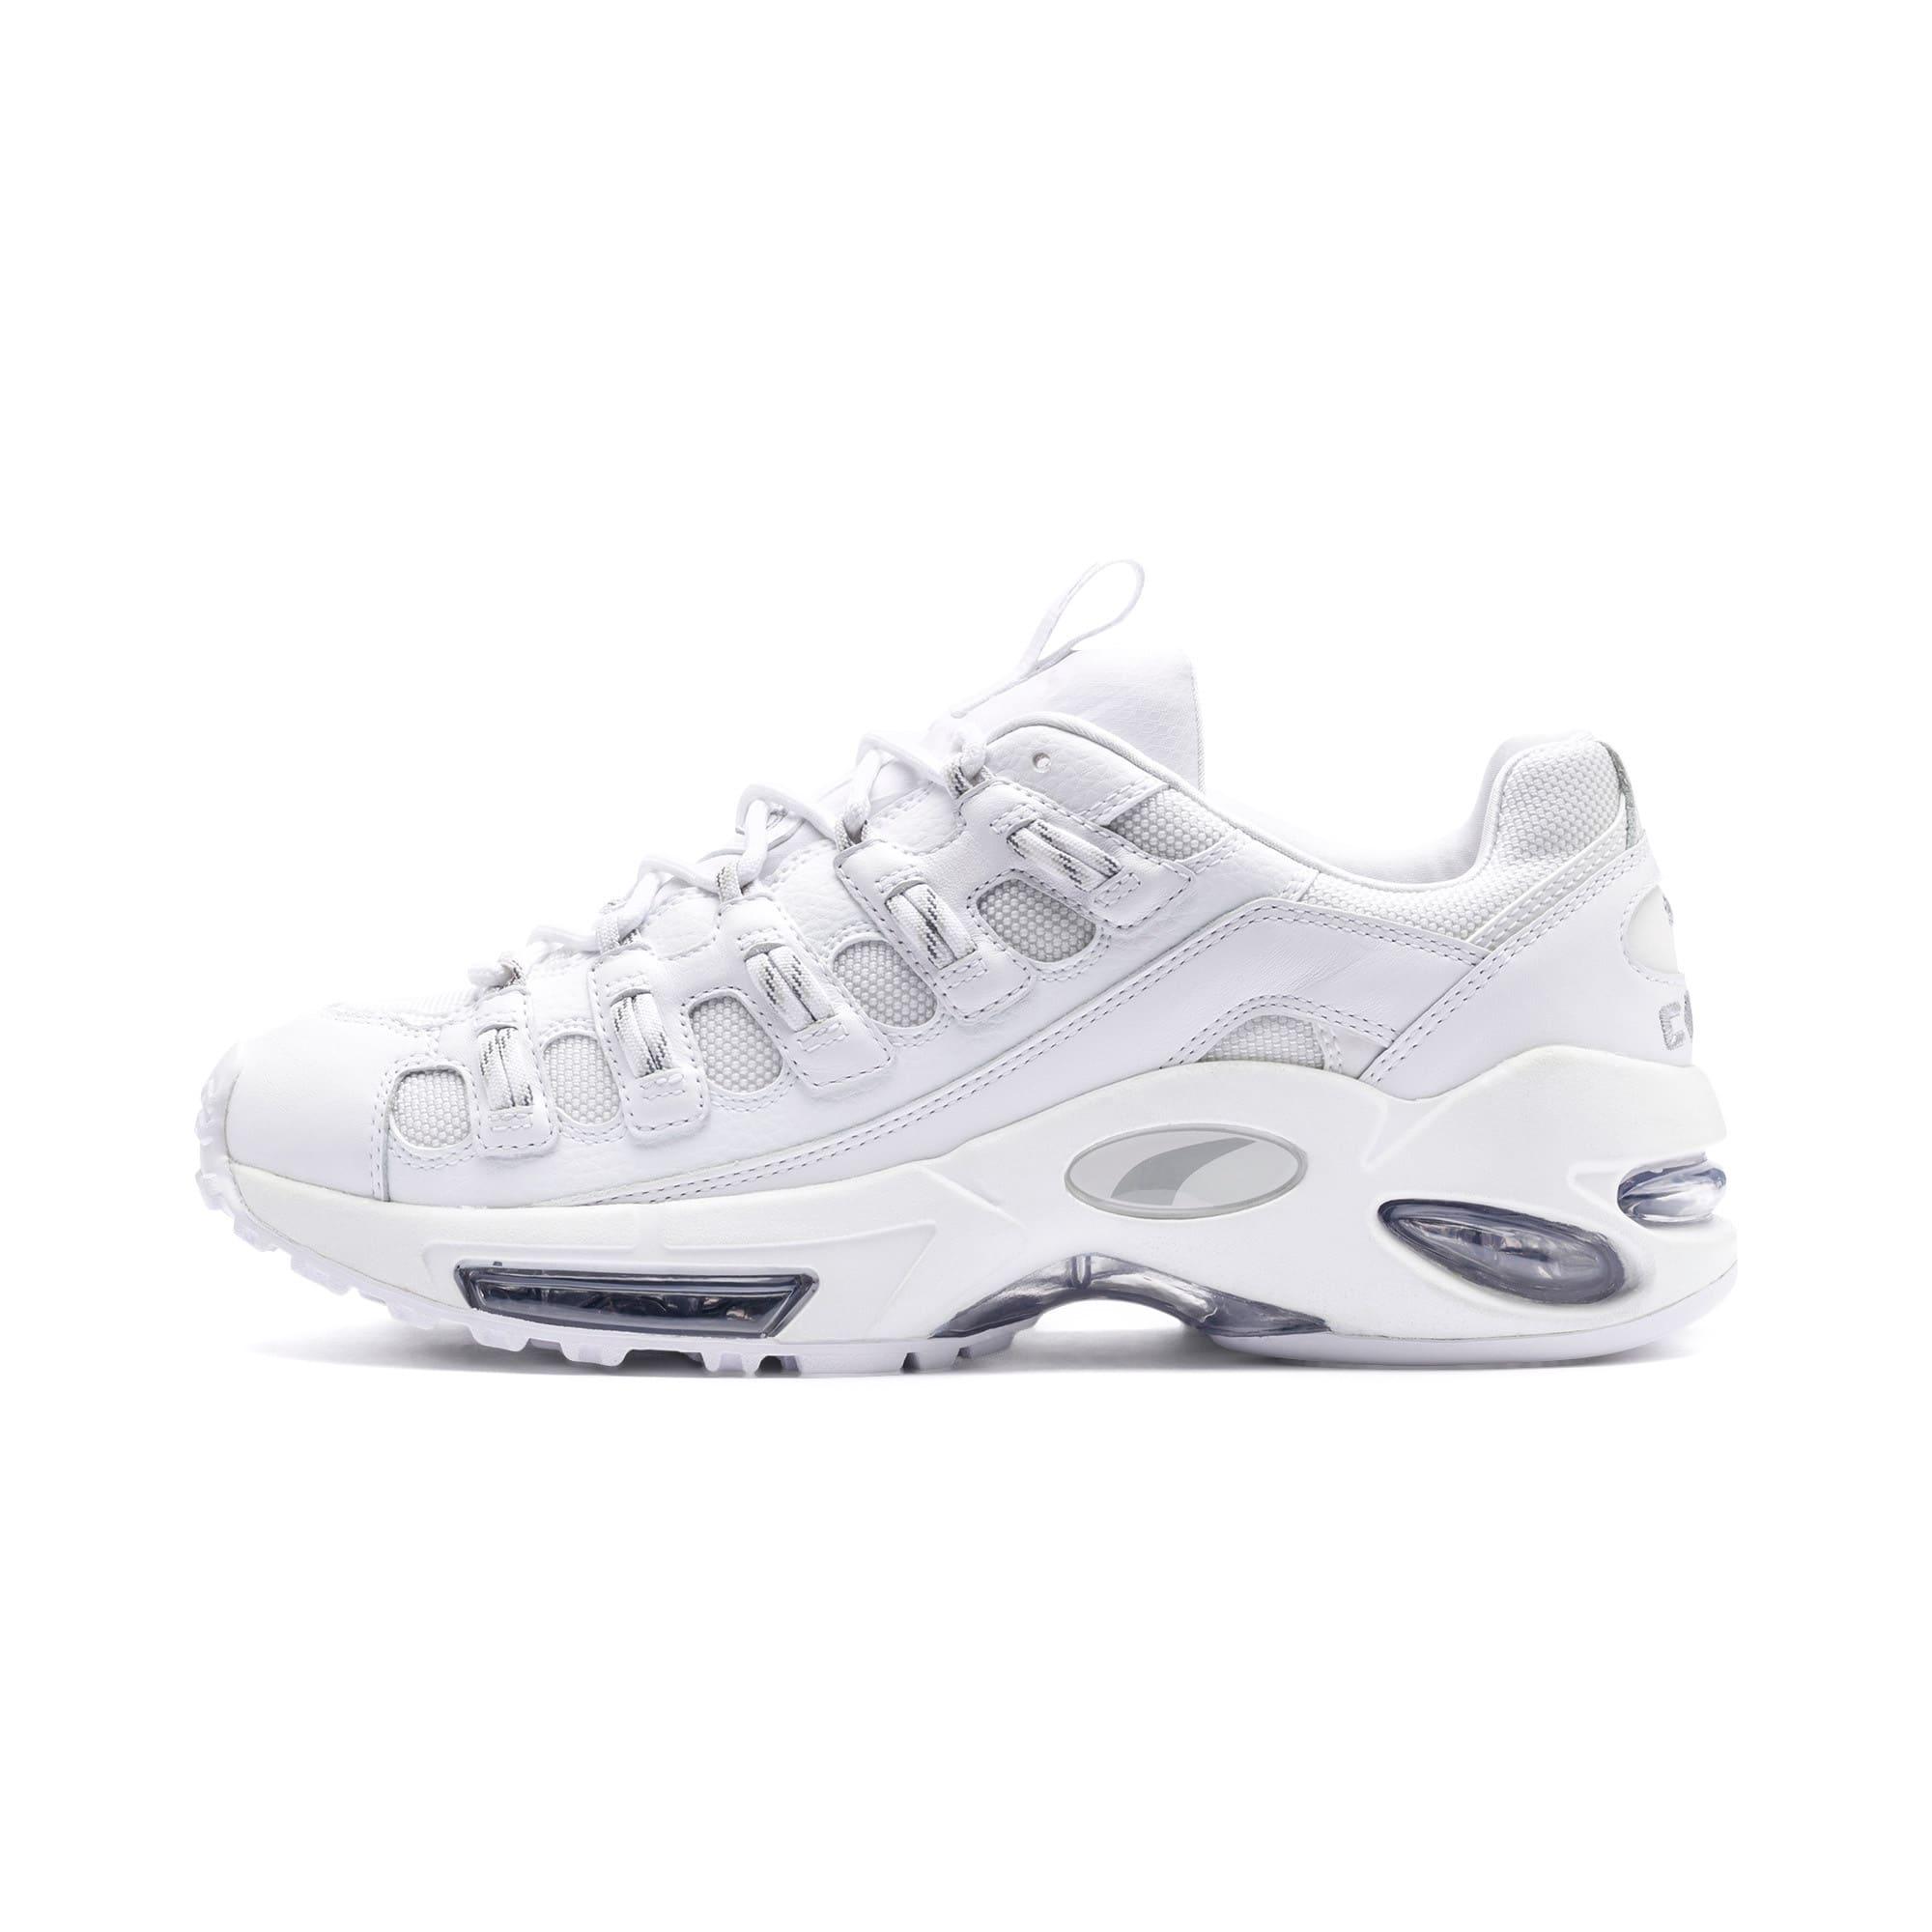 Thumbnail 1 of CELL Endura Rebound Sneaker, Puma White-Puma White, medium